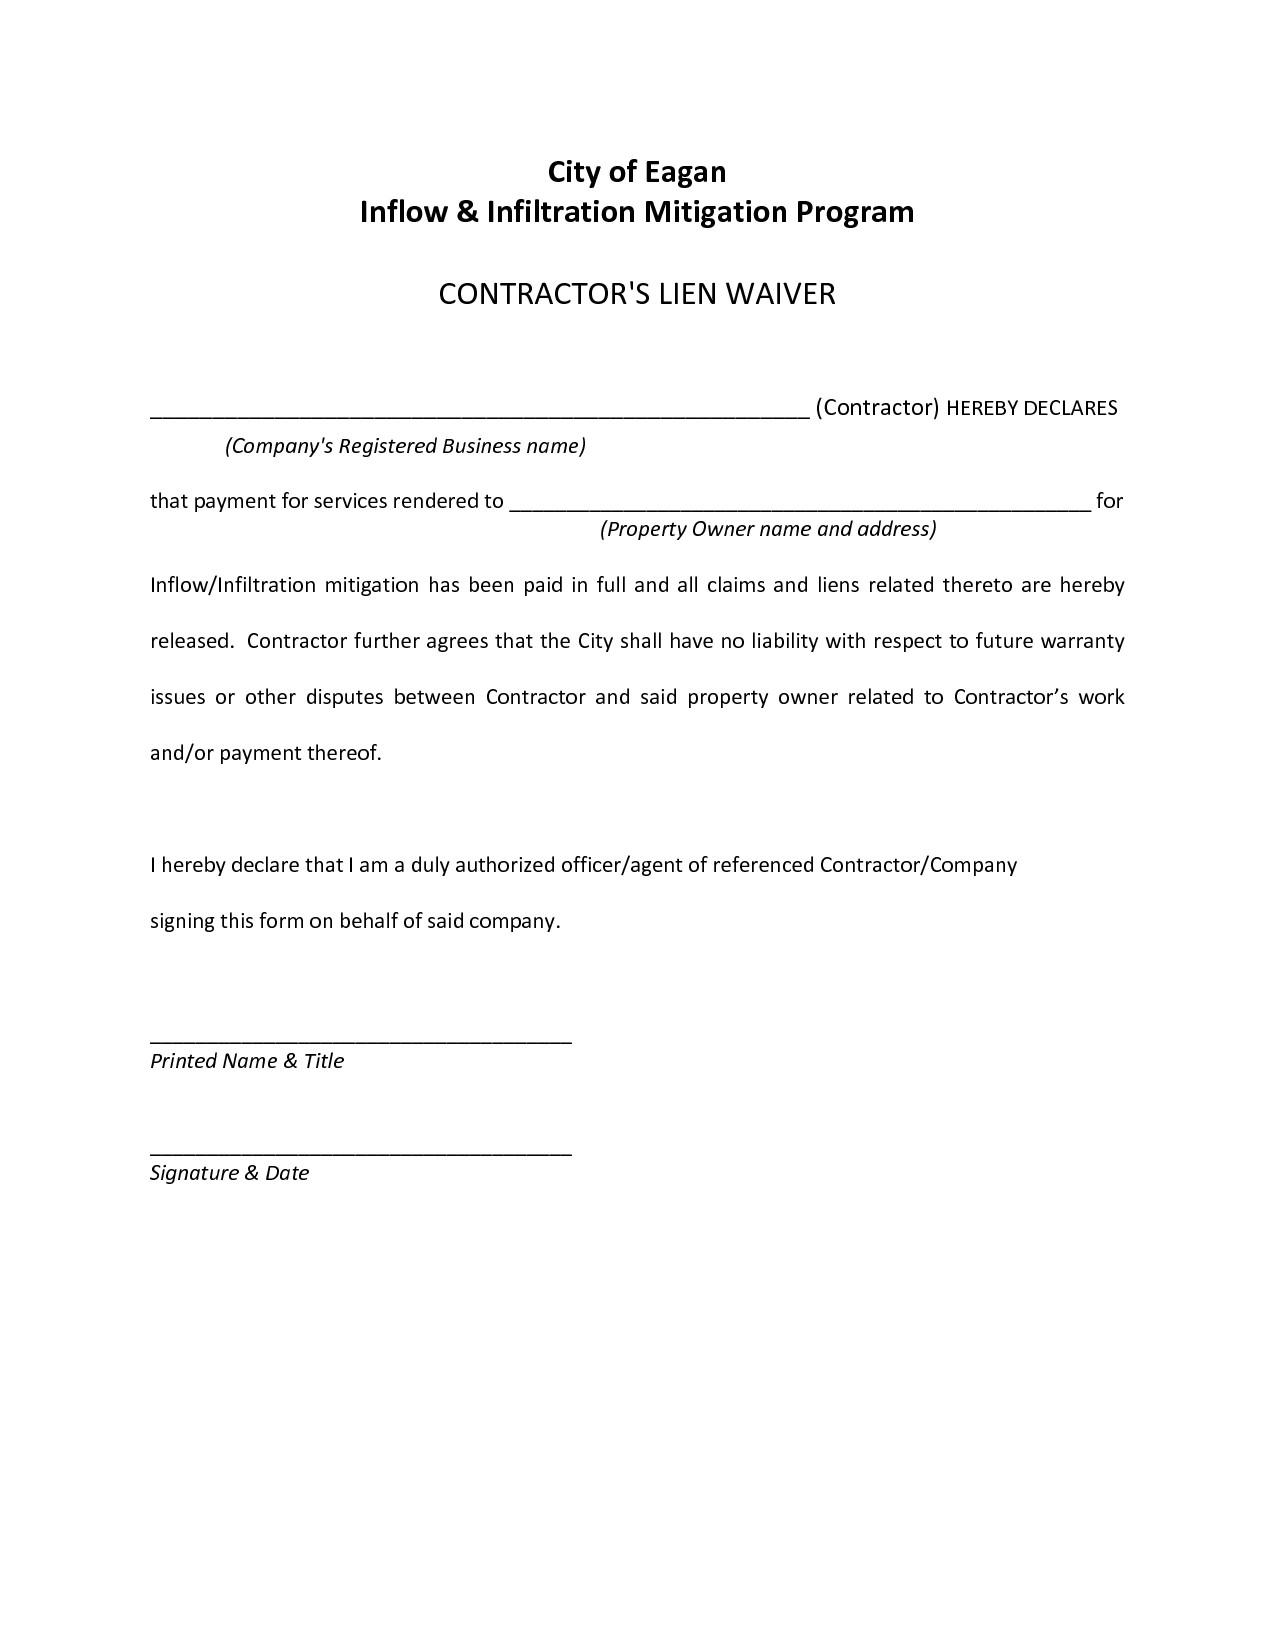 Lien Letter Template - Staggering Tax Lien Release Letter